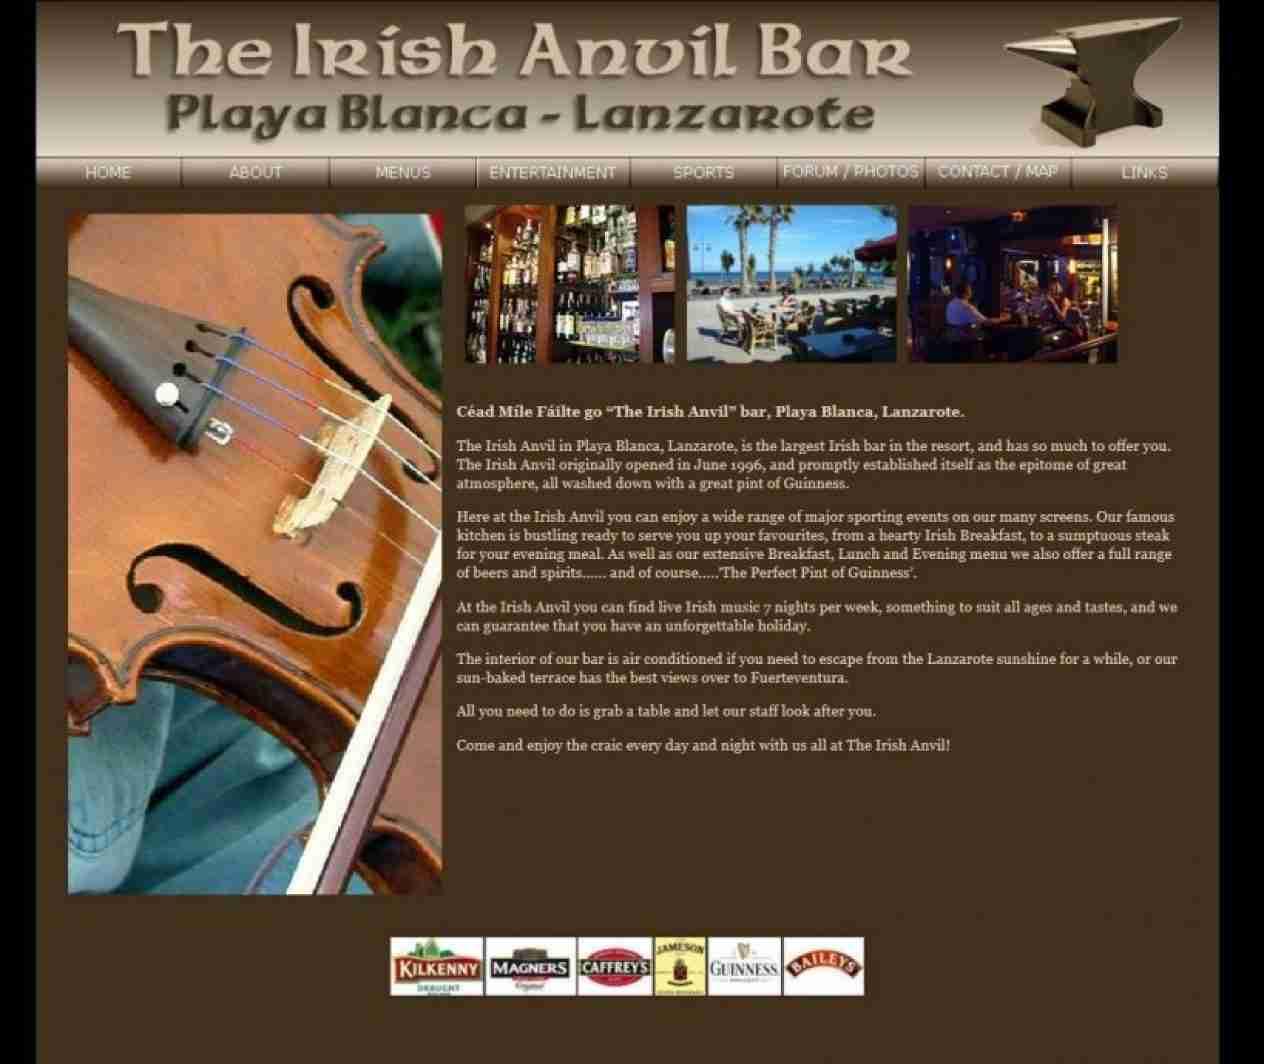 The Irish Anvil Bar